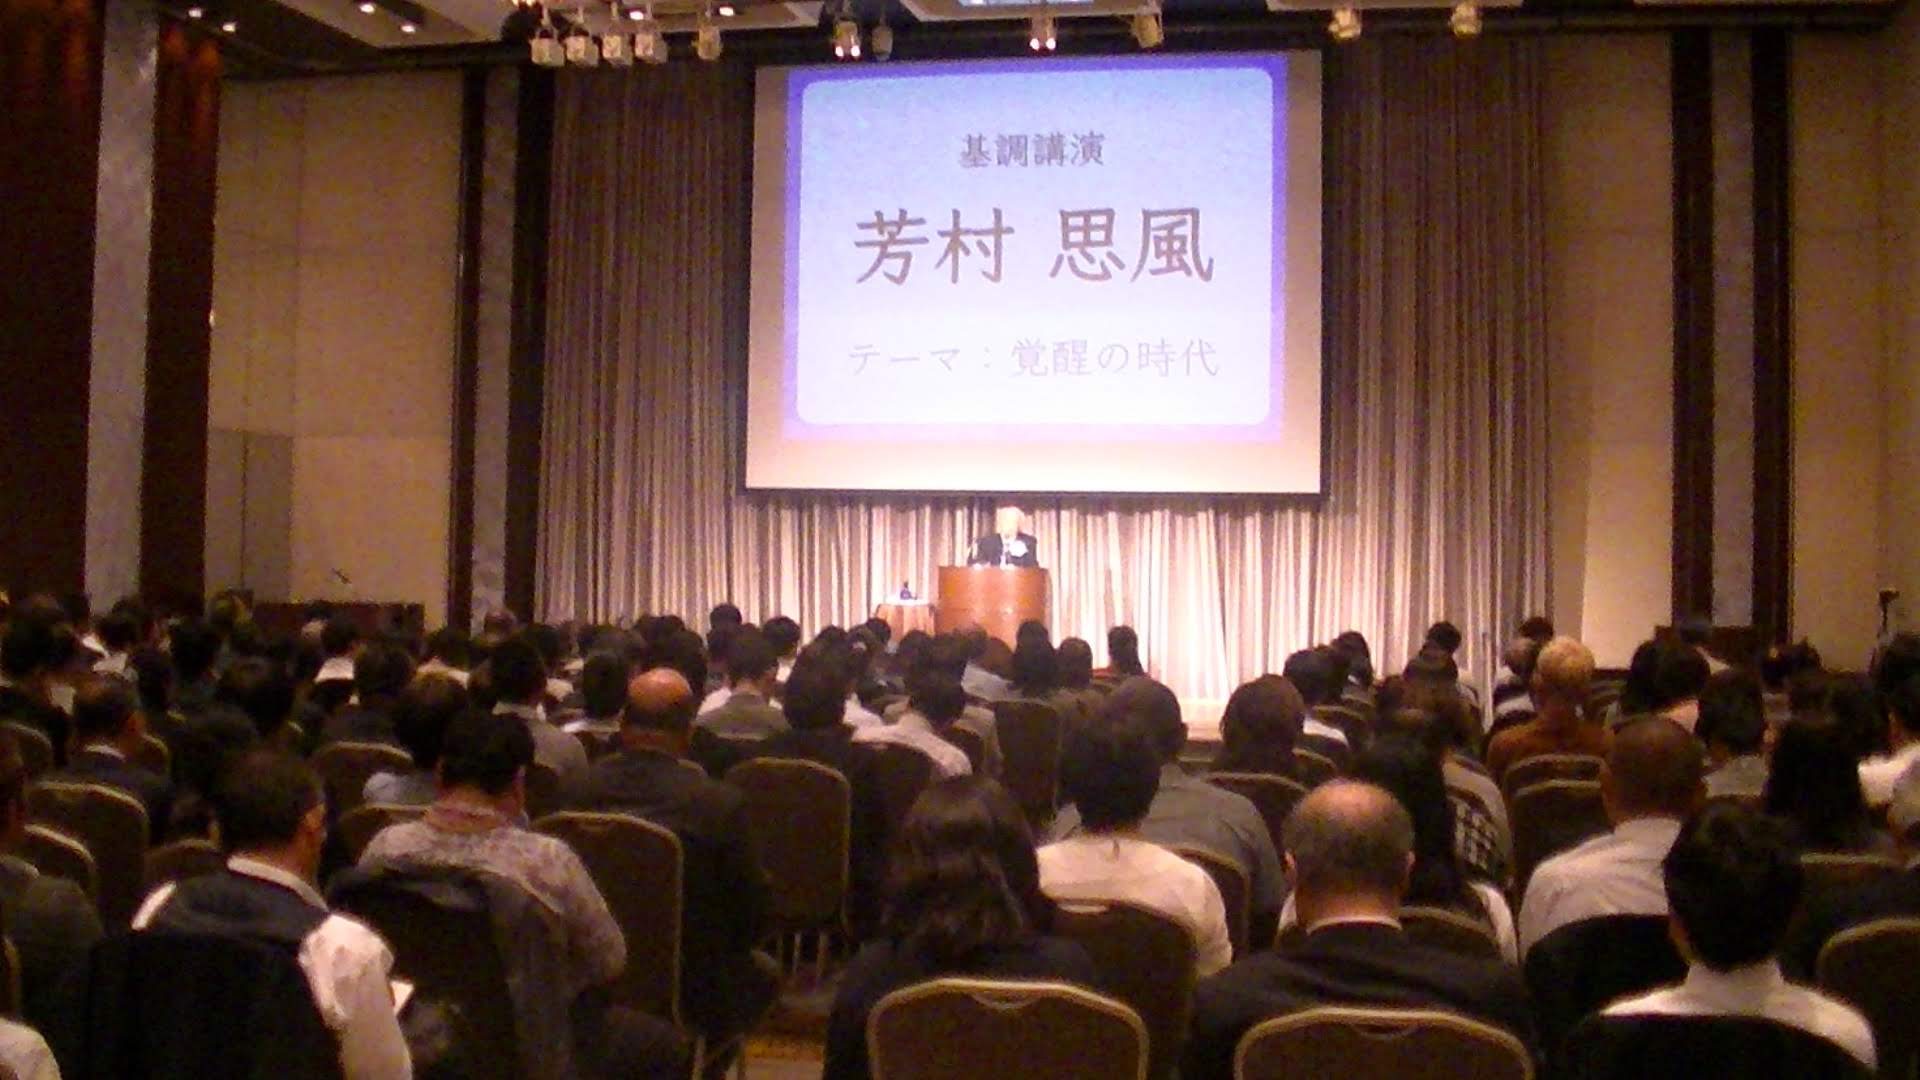 PIC 1713 1 - 思風会全国大会in広島